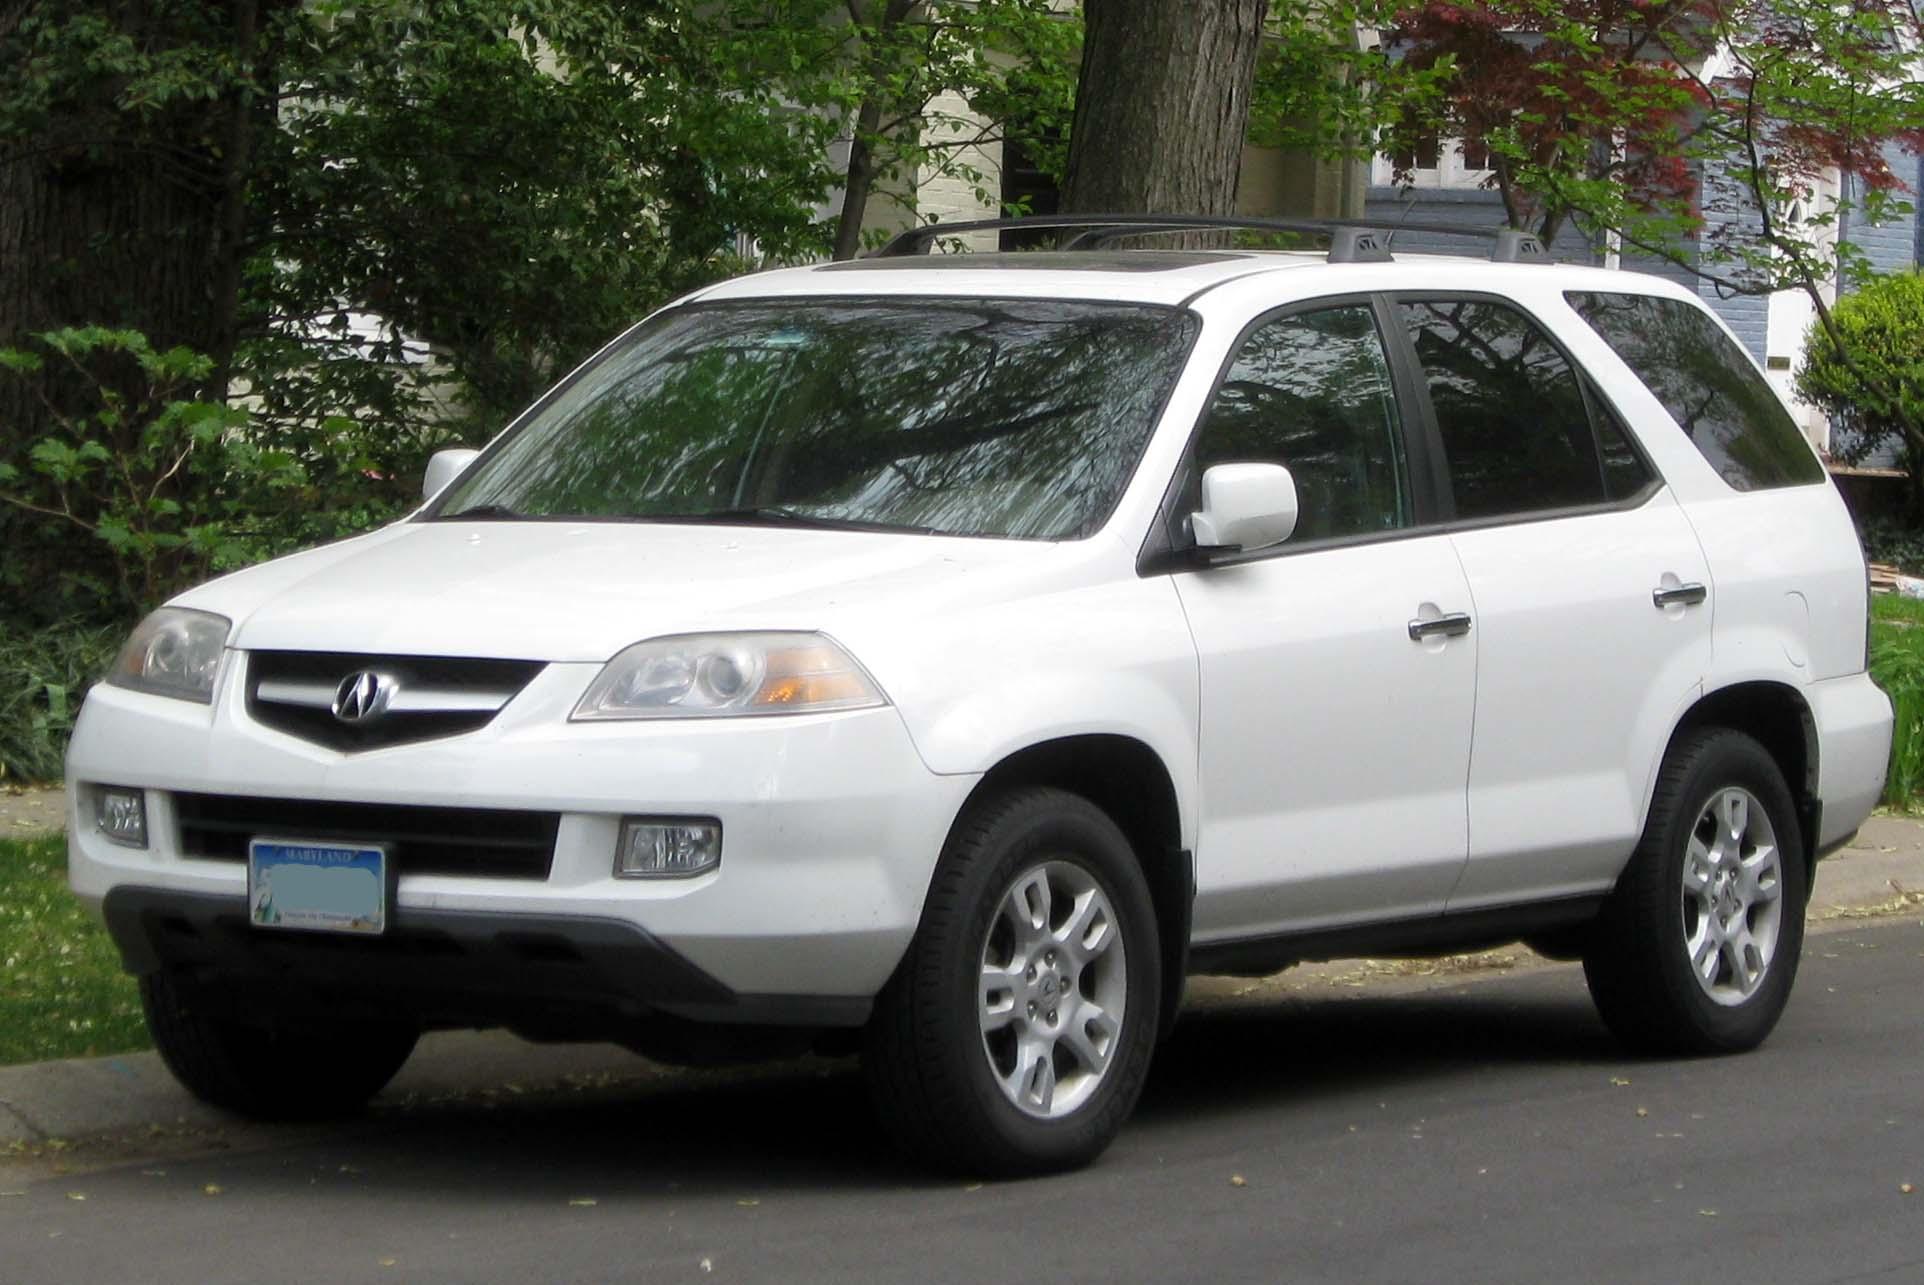 File:2004-2006 Acura MDX -- 04-11-2012.JPG - Wikimedia Commons